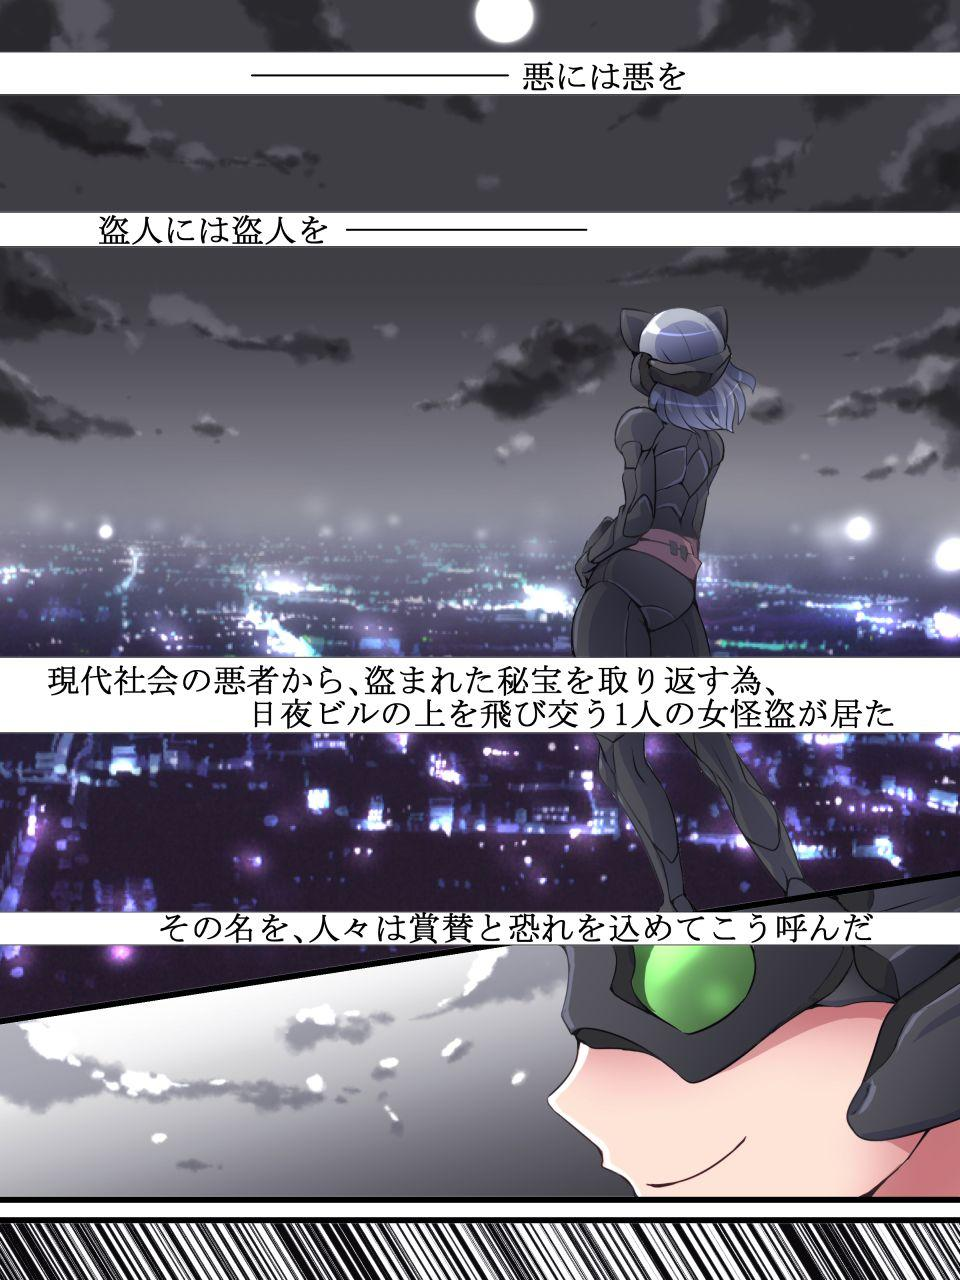 Kaitou Silver Cat Manga Ban Dai 1-wa 5